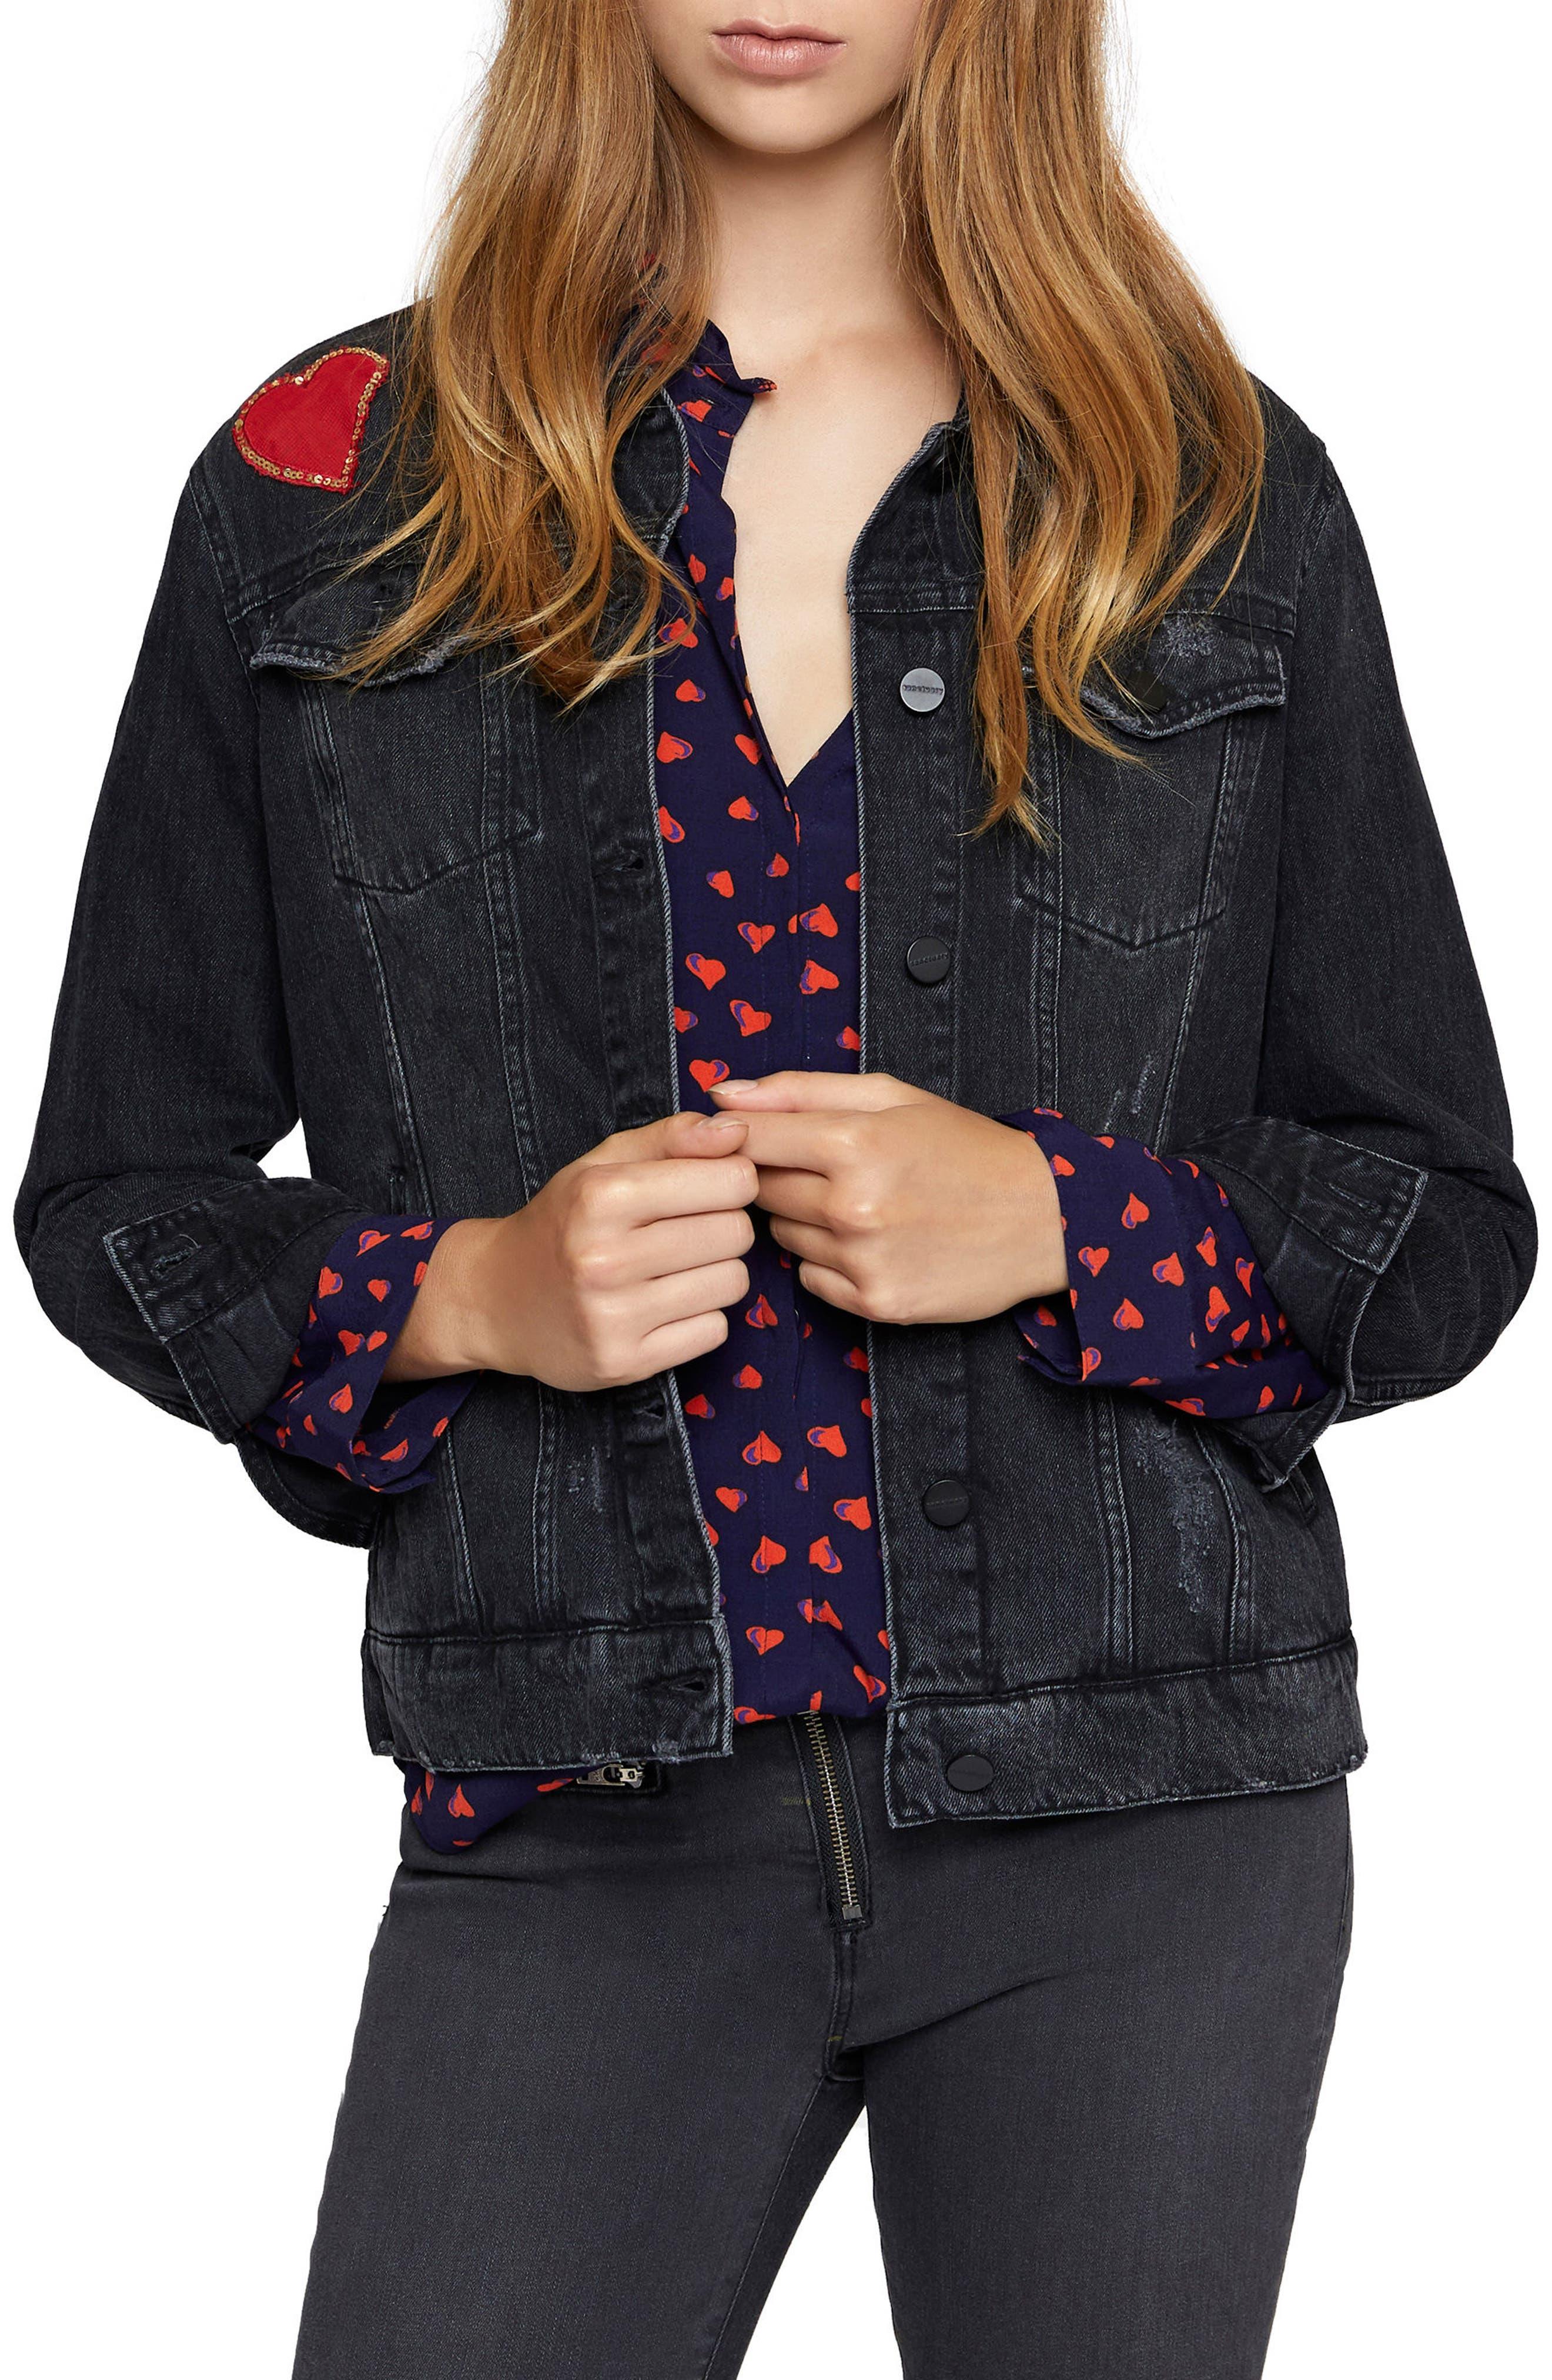 Heartbreaker Denim Jacket,                         Main,                         color, 010